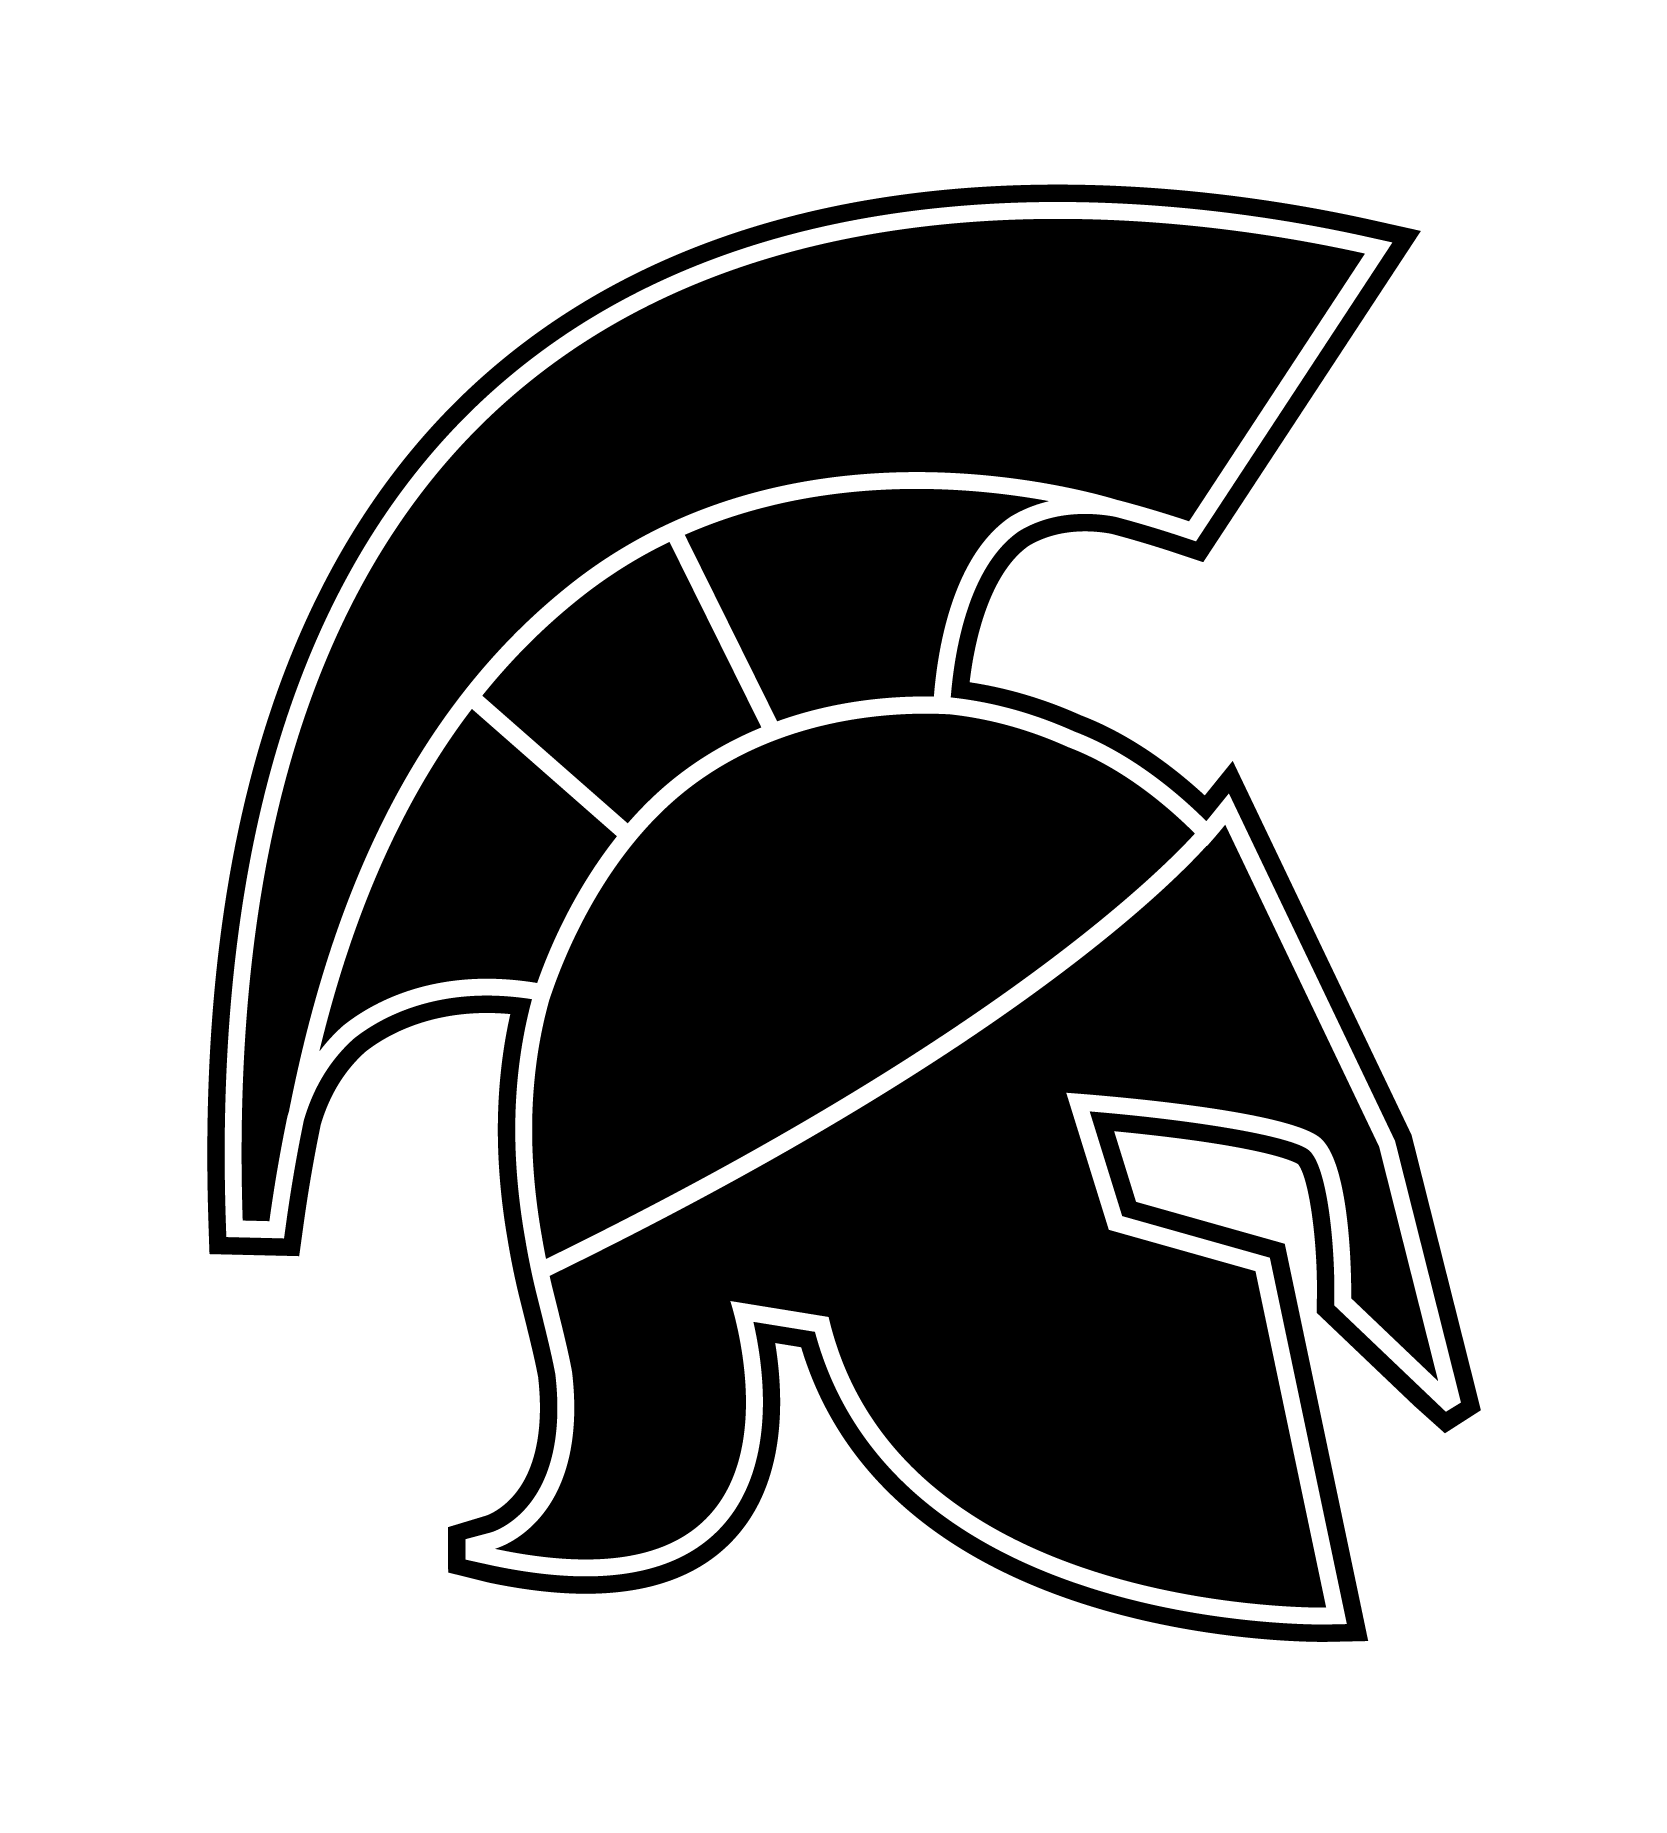 Spartan clipart wins. Basketball dasche spartans football